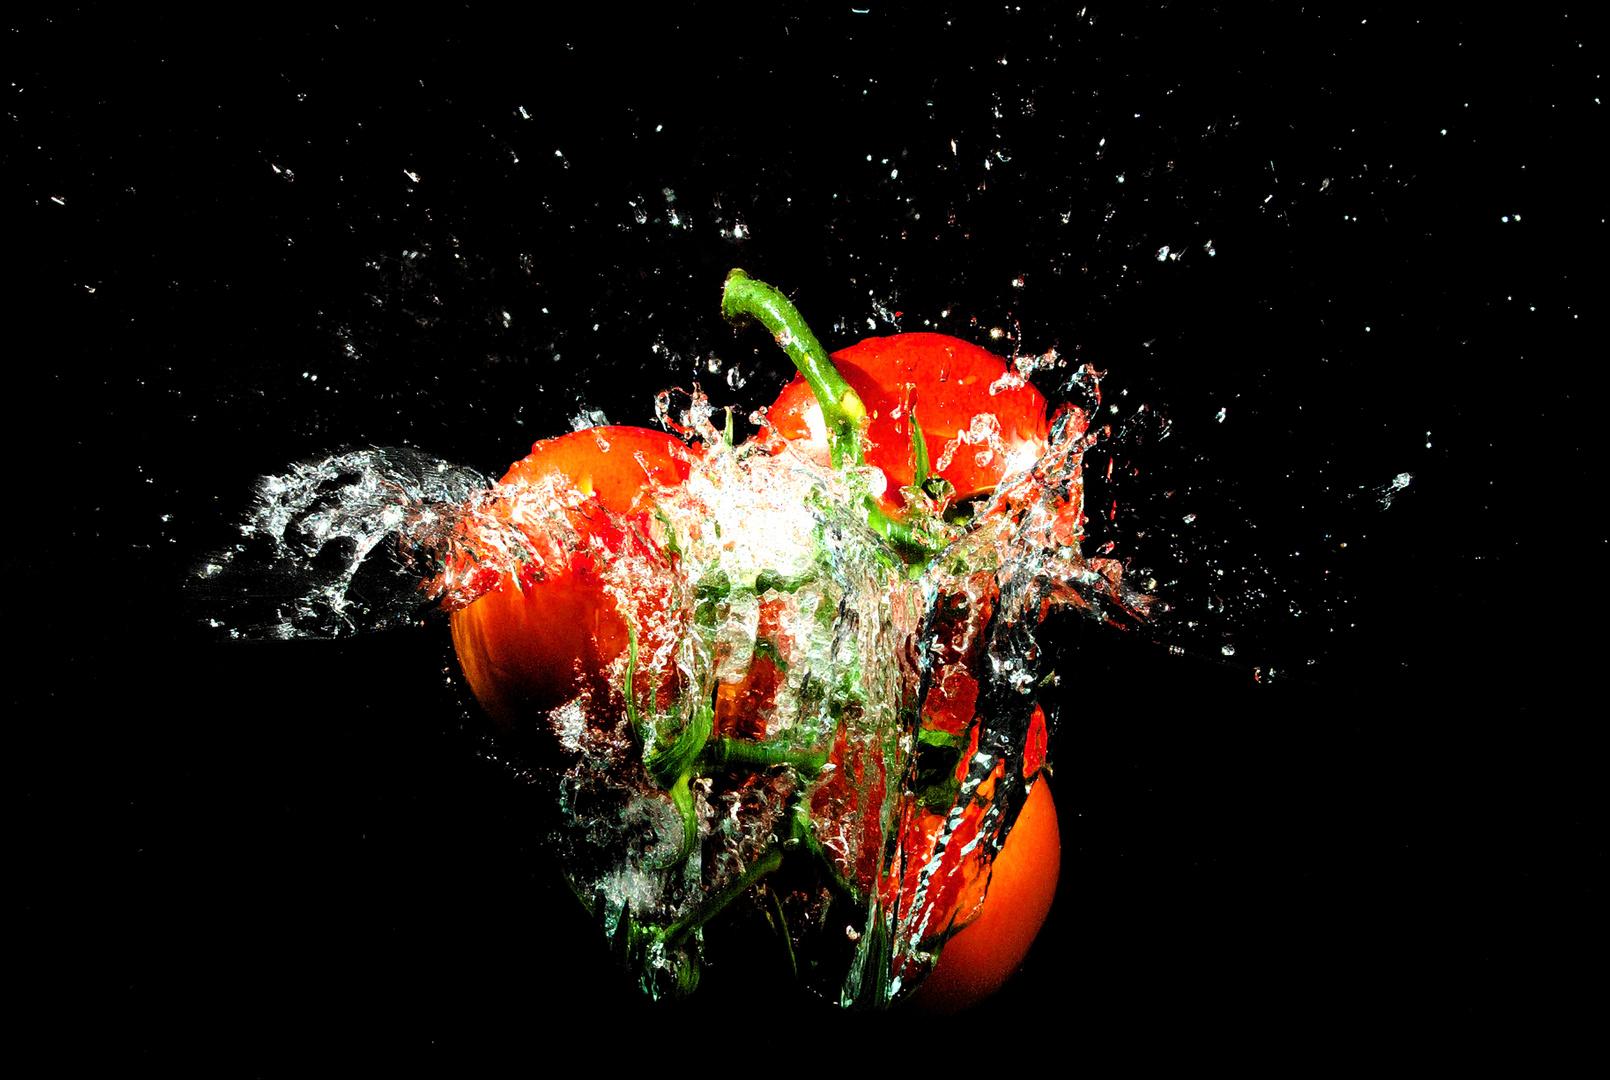 Splash! Tomaten